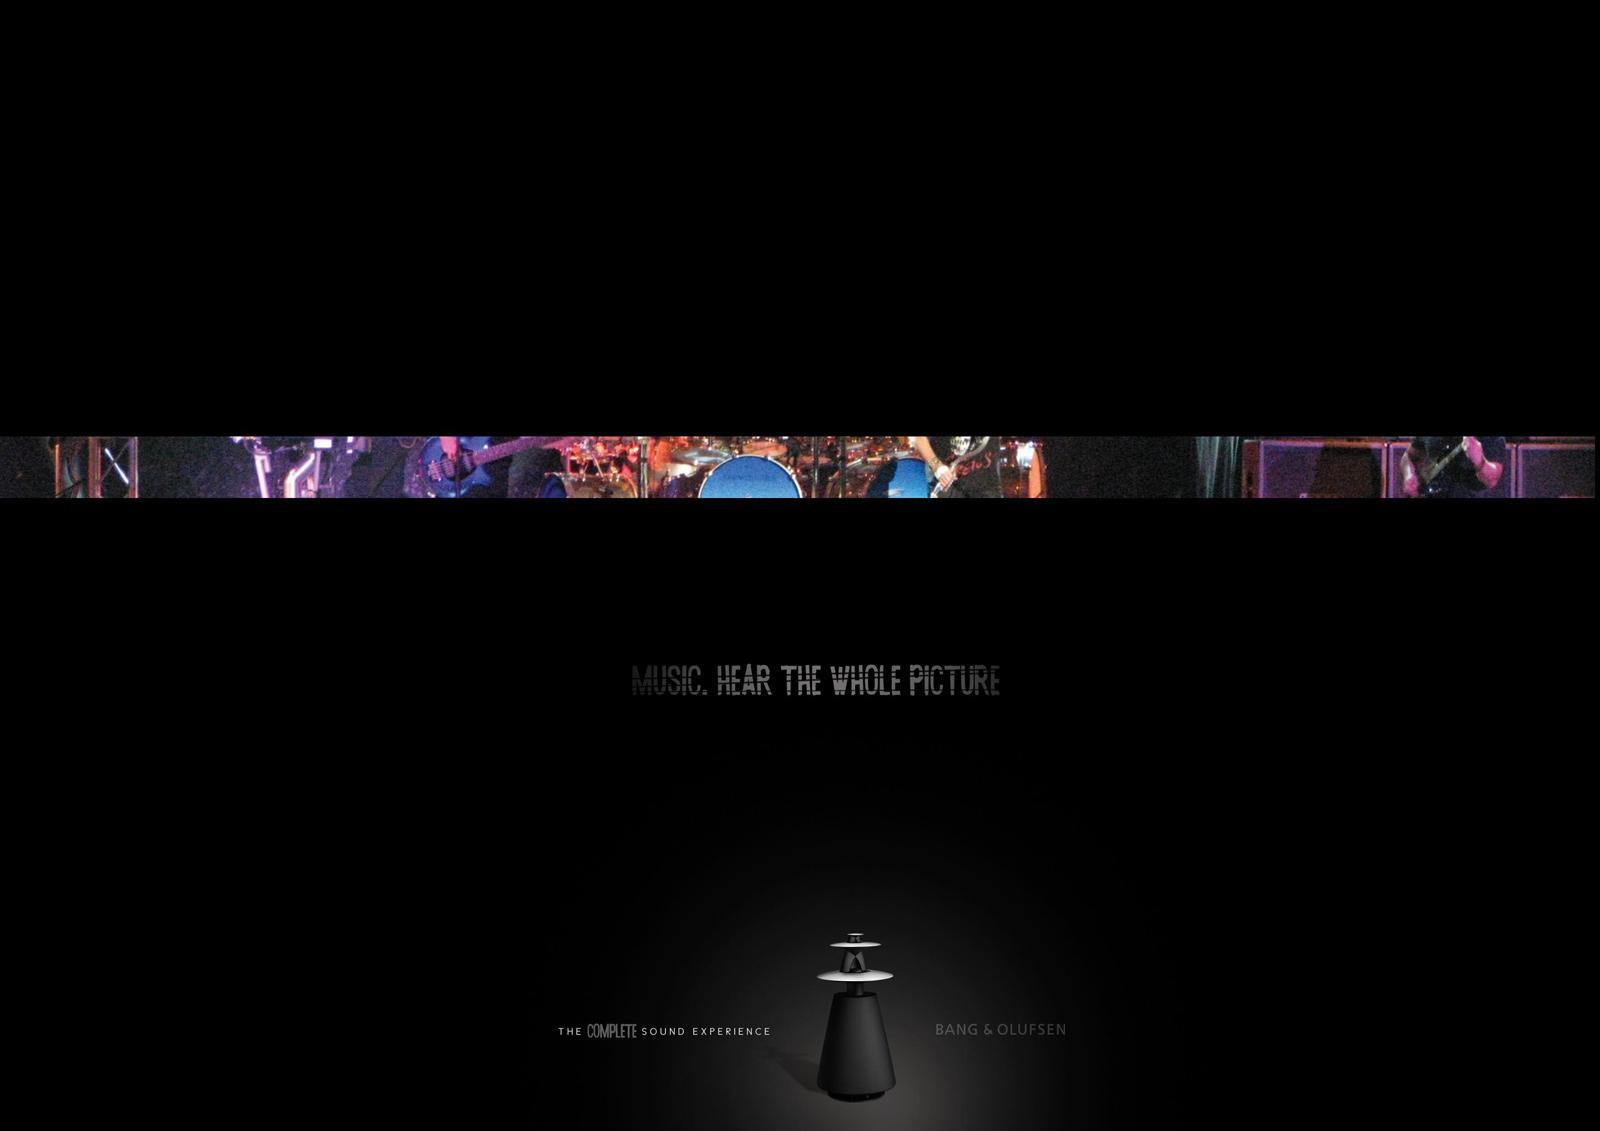 Bang & Olufsen Print Ad -  Rock